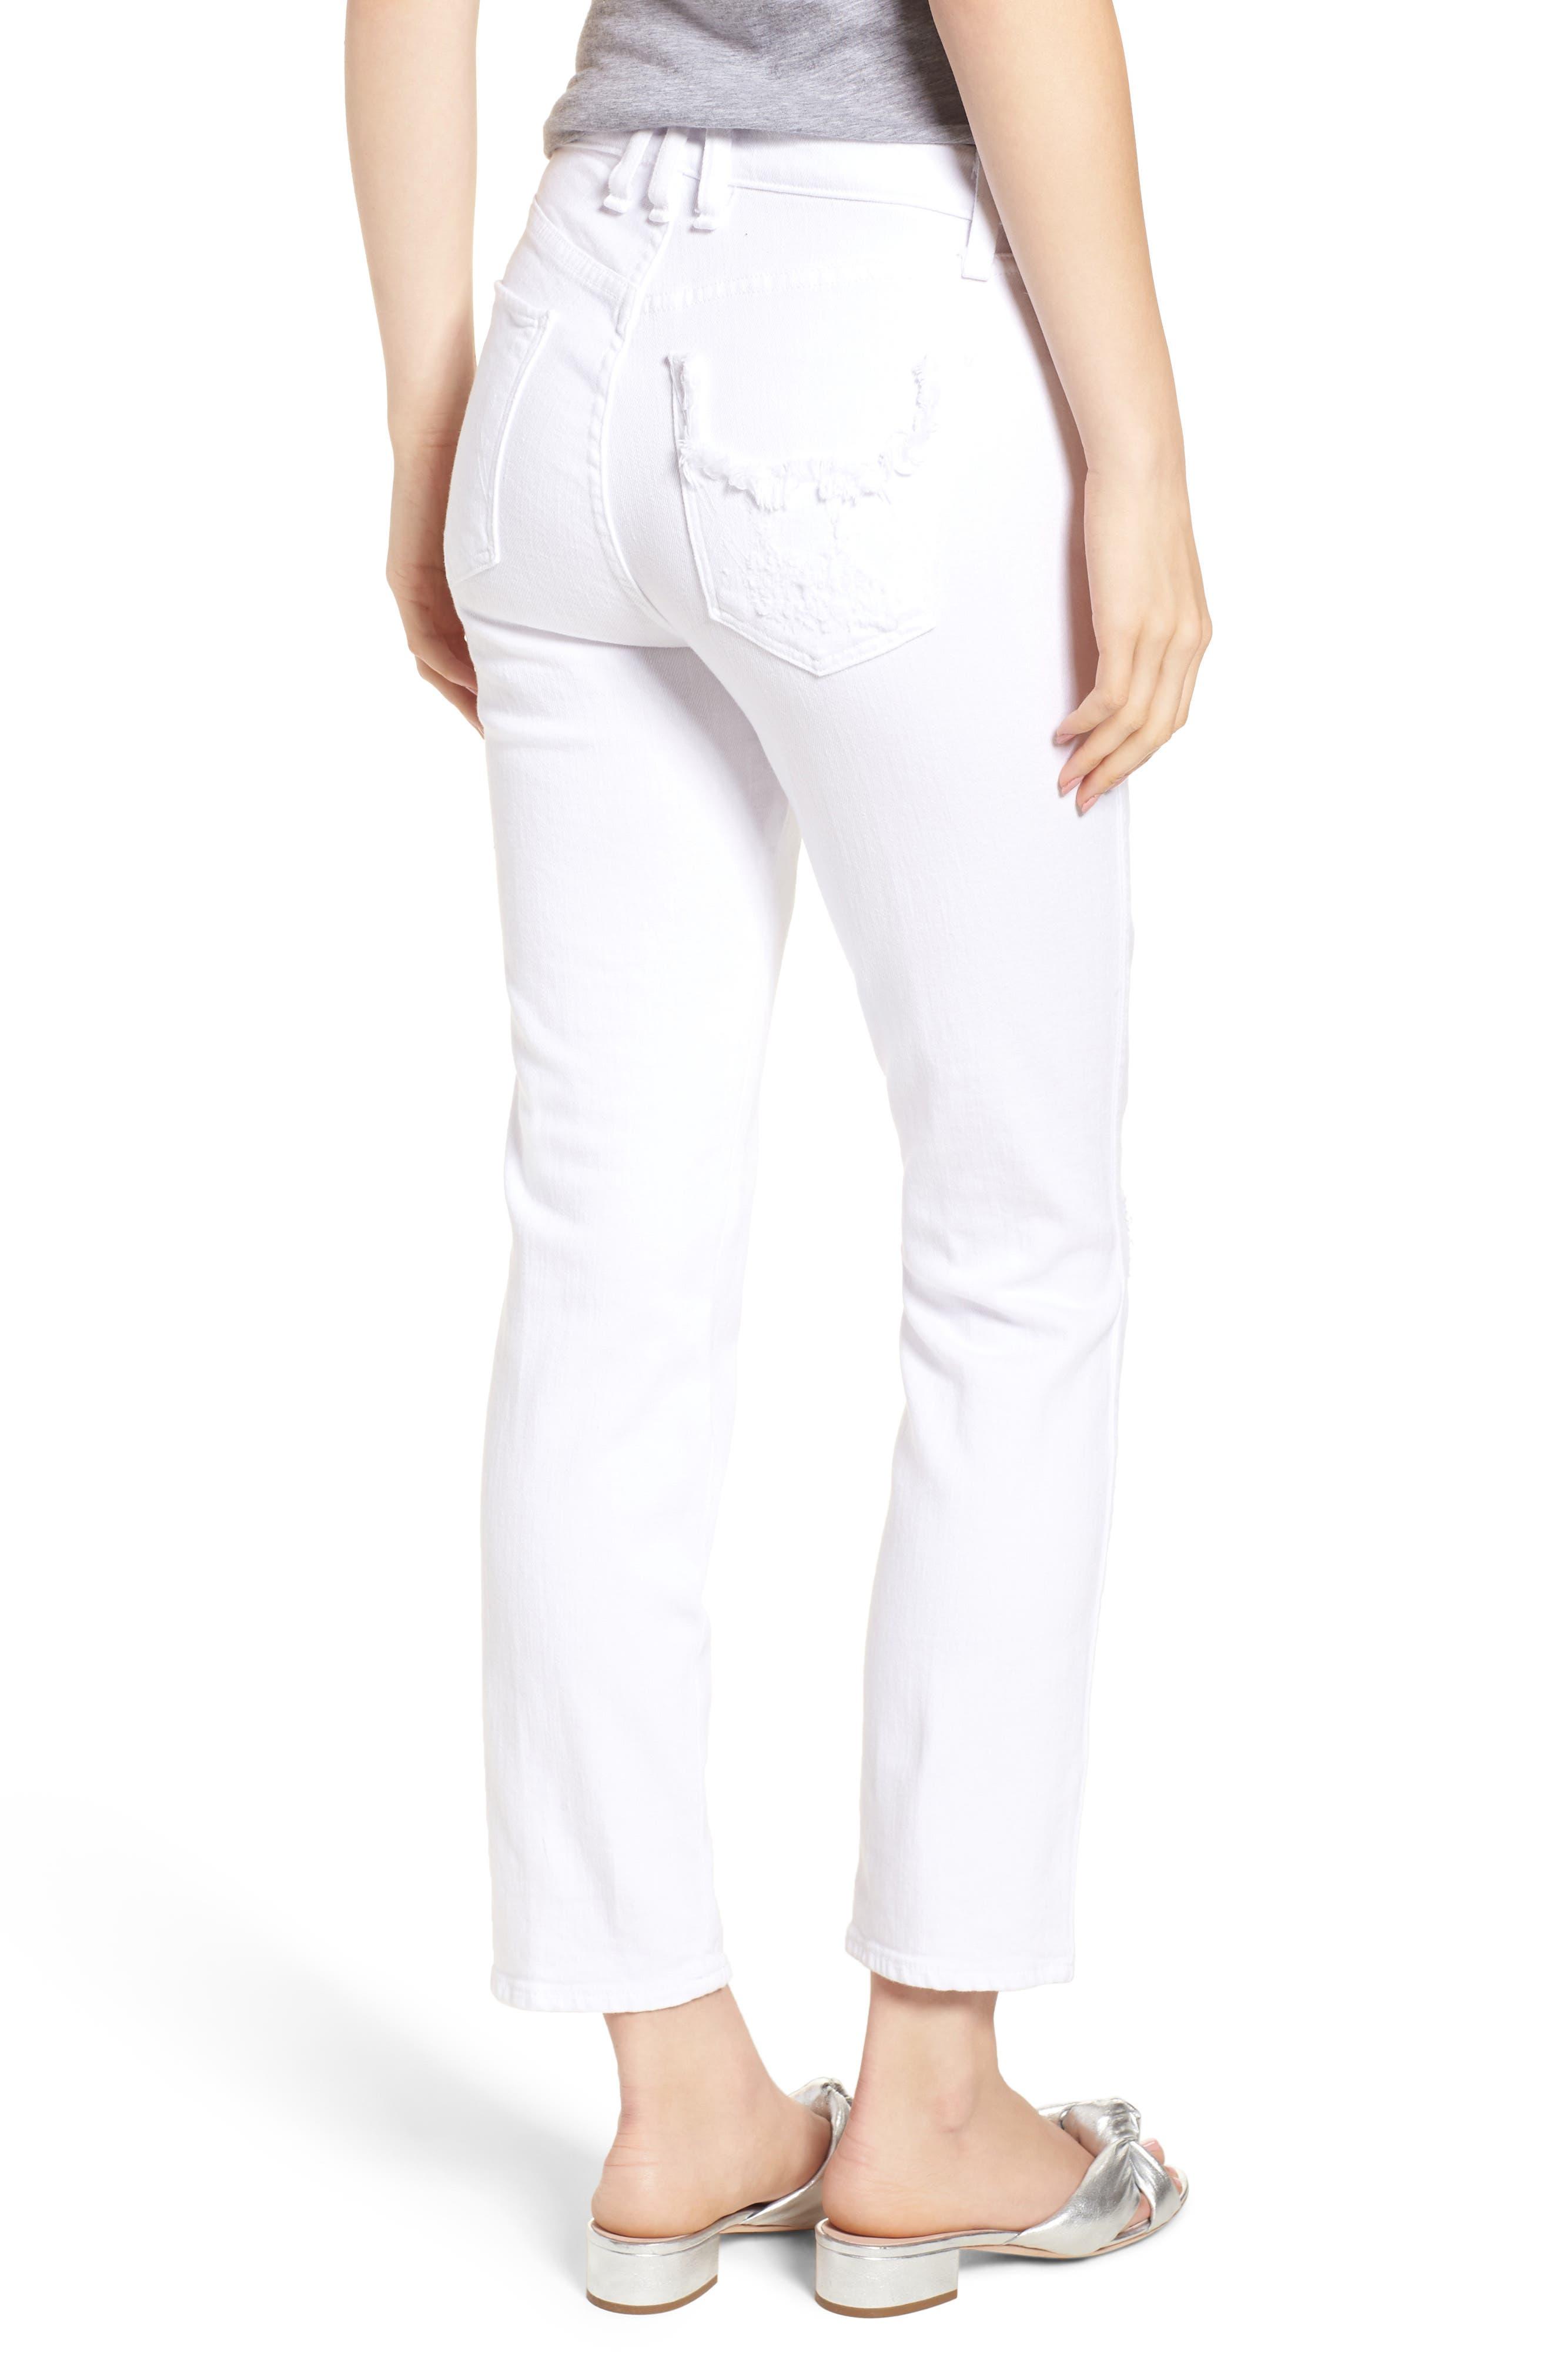 Kaia Distressed High Waist Slim Jeans,                             Alternate thumbnail 2, color,                             100